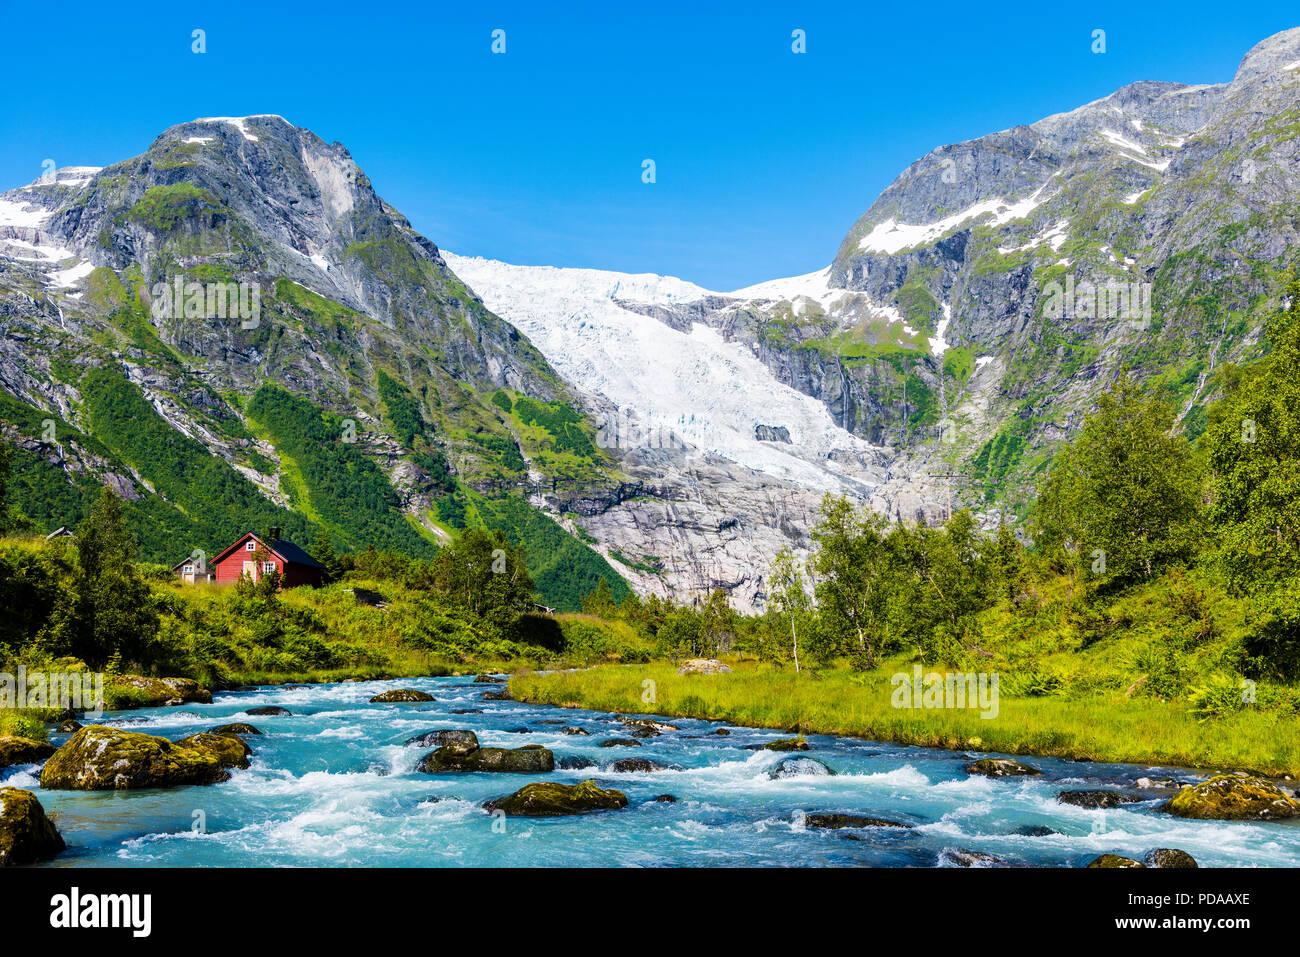 Bøyumbreen, a glacier in Western Norway. Bøyumbreen, or Bøyabreen, is an arm of Norway´s largest glacier, Jostedalsbreen in Sogn og Fjordane. Stock Photo